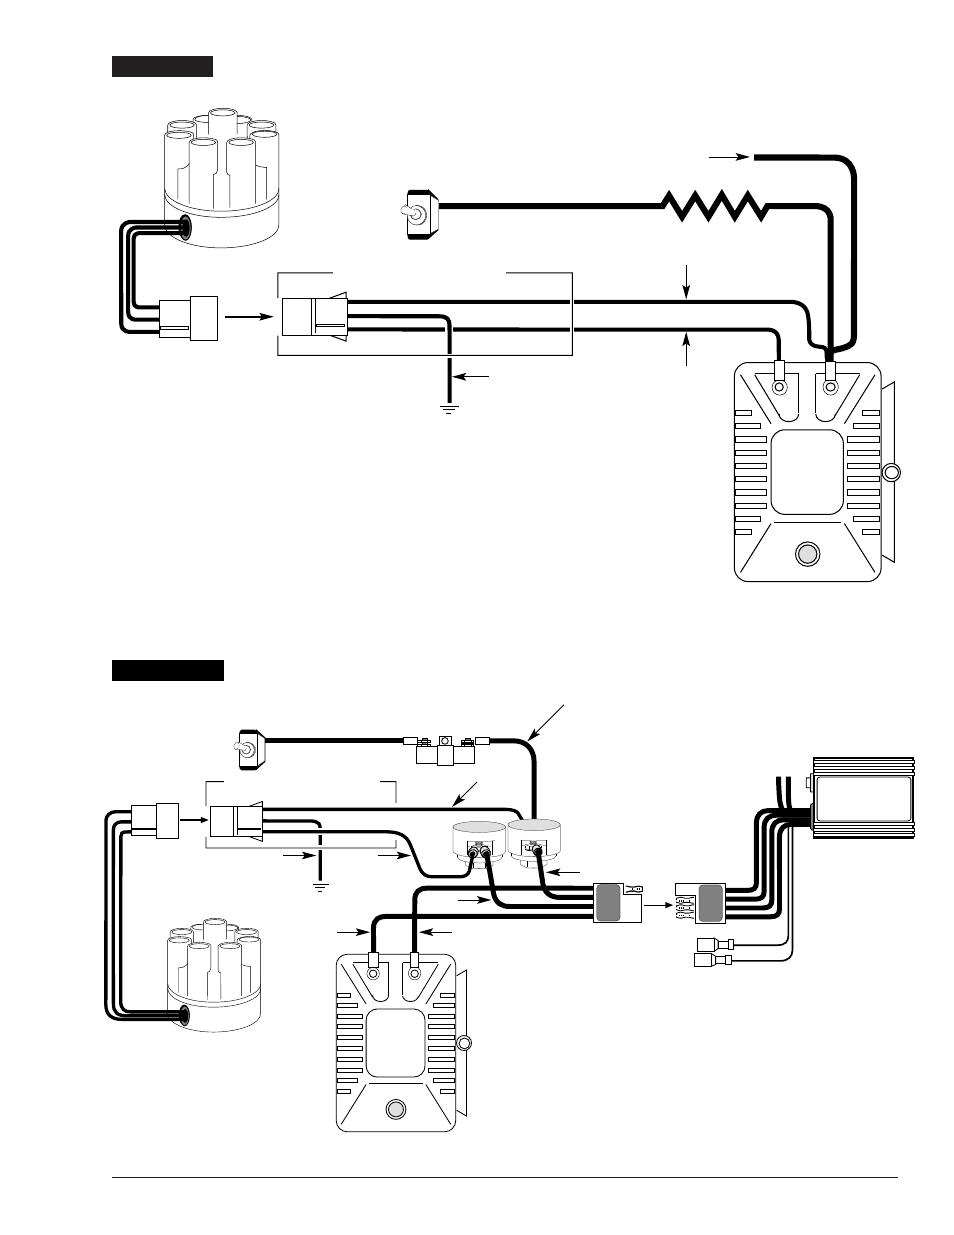 Mallory Ignition Unilite Distributor User Manual Page 8 13